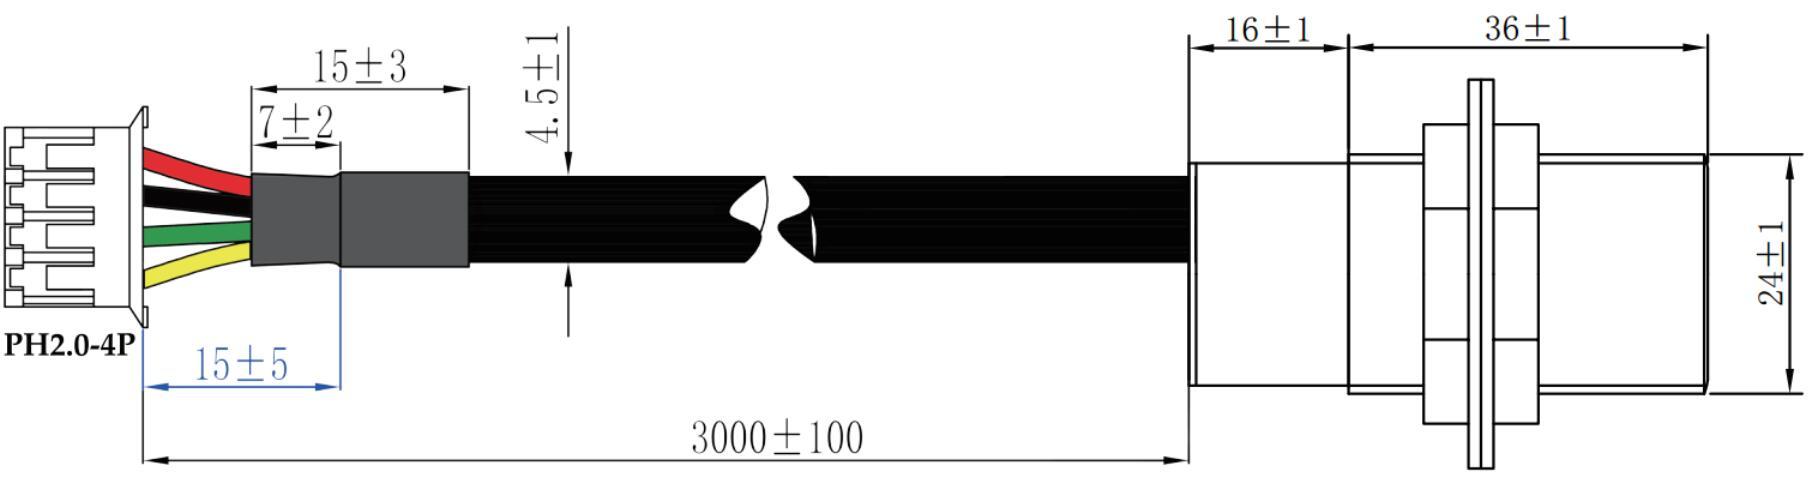 SEN0243_尺寸图_2.jpg